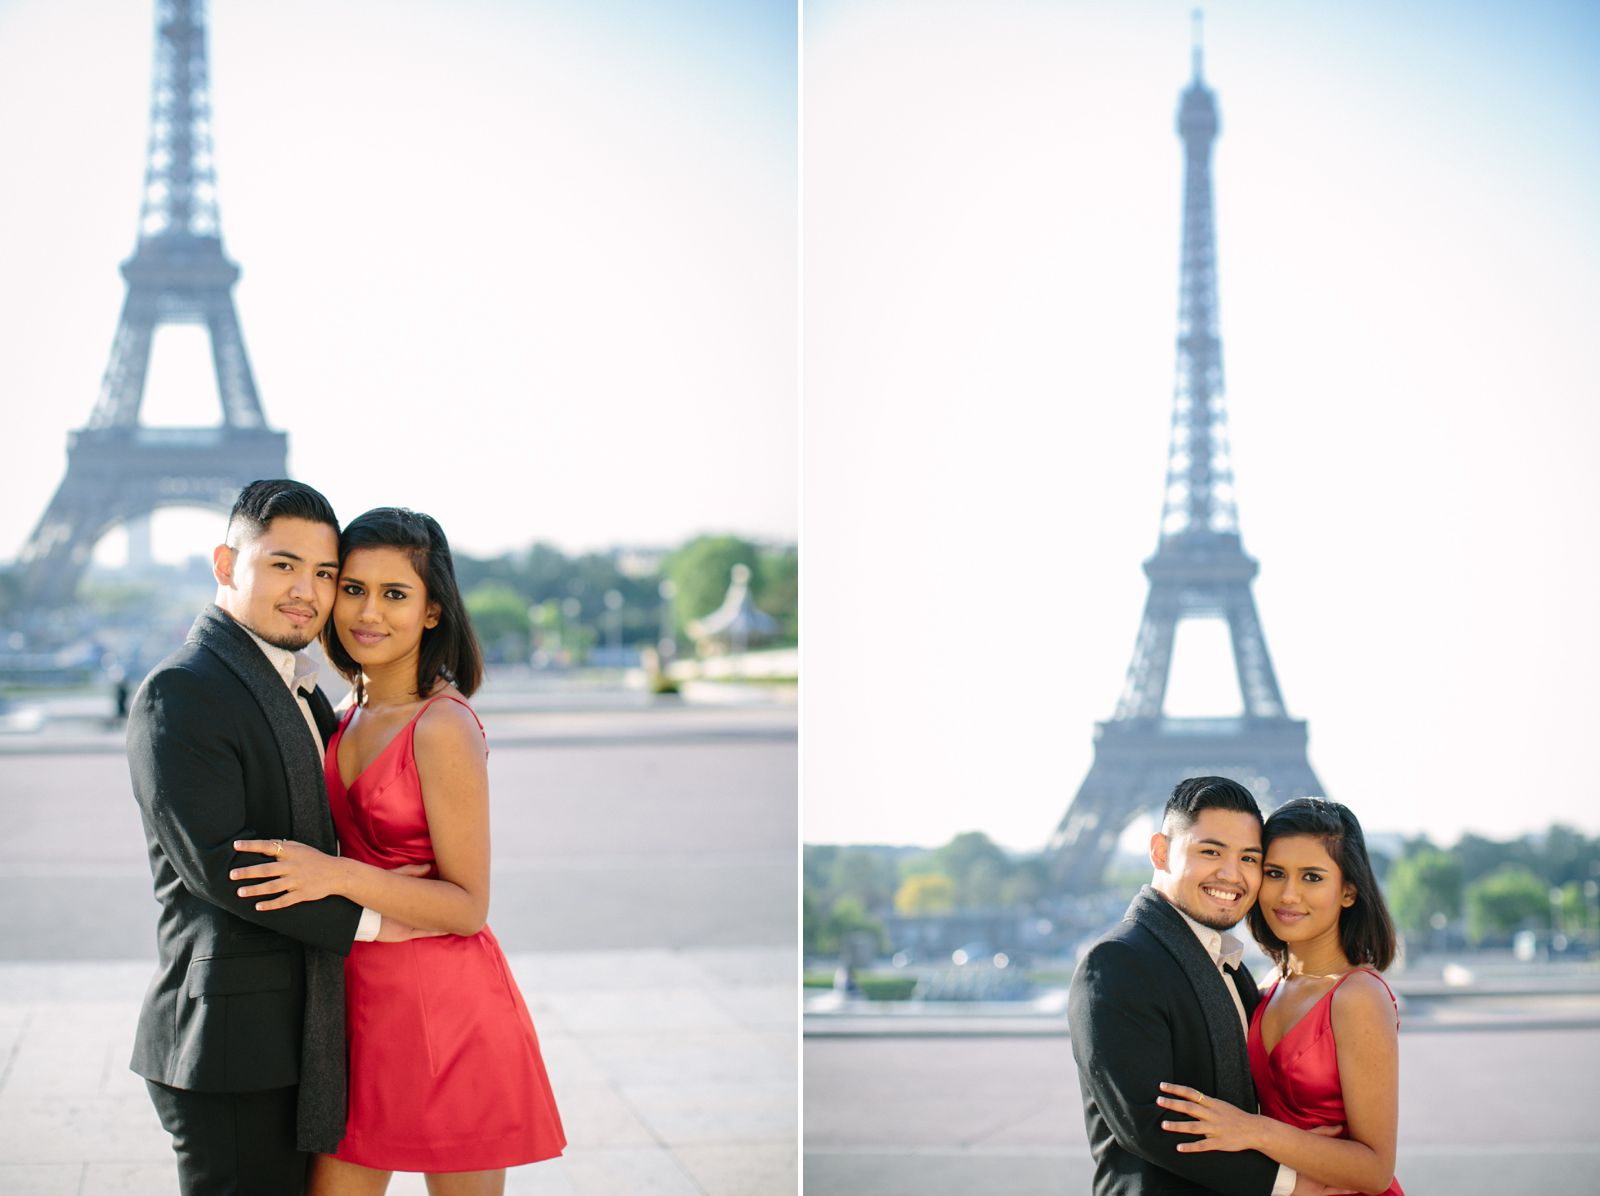 EngagementShoot-Eiffel-Tower_1286.jpg